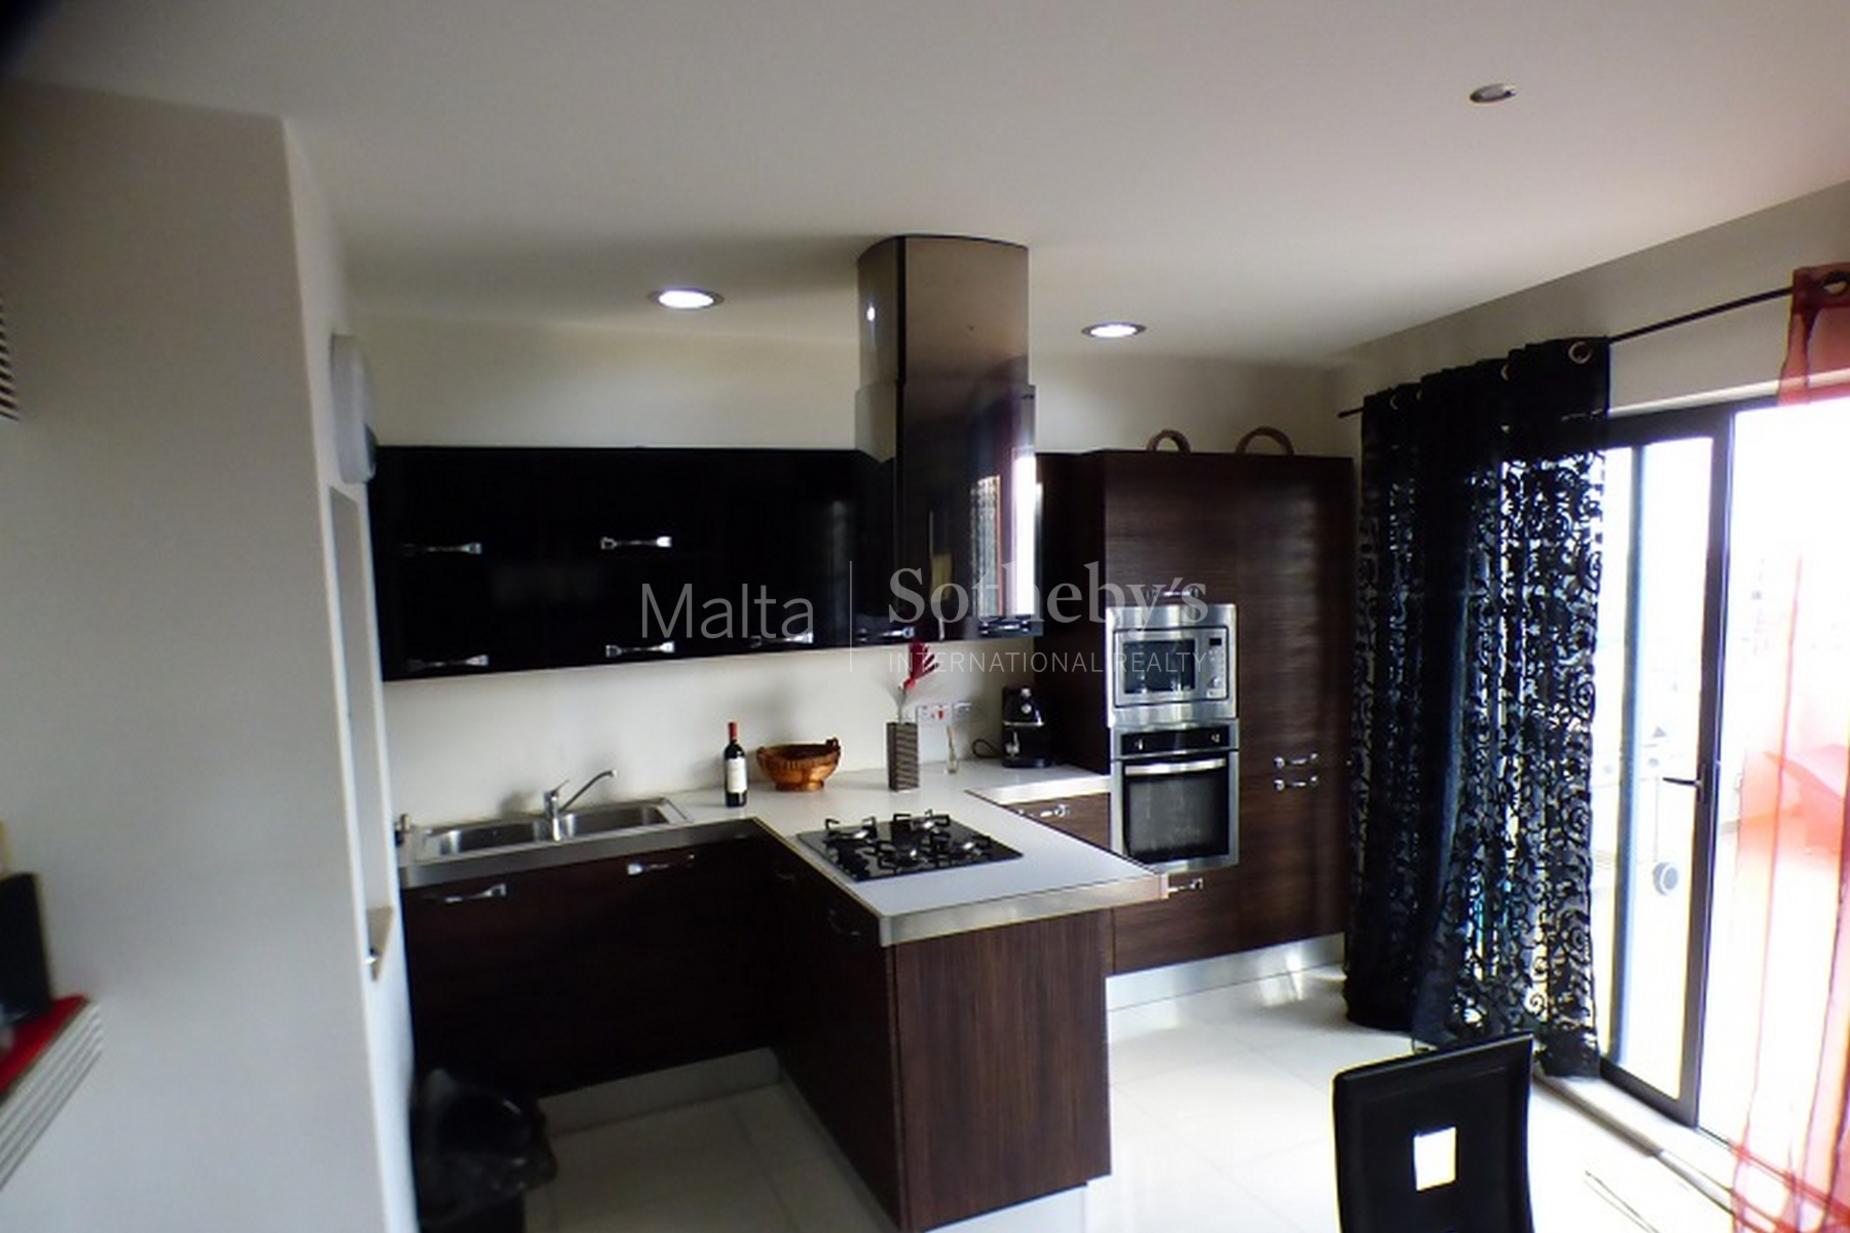 2 bed Penthouse For Rent in Gzira, Gzira - thumb 2